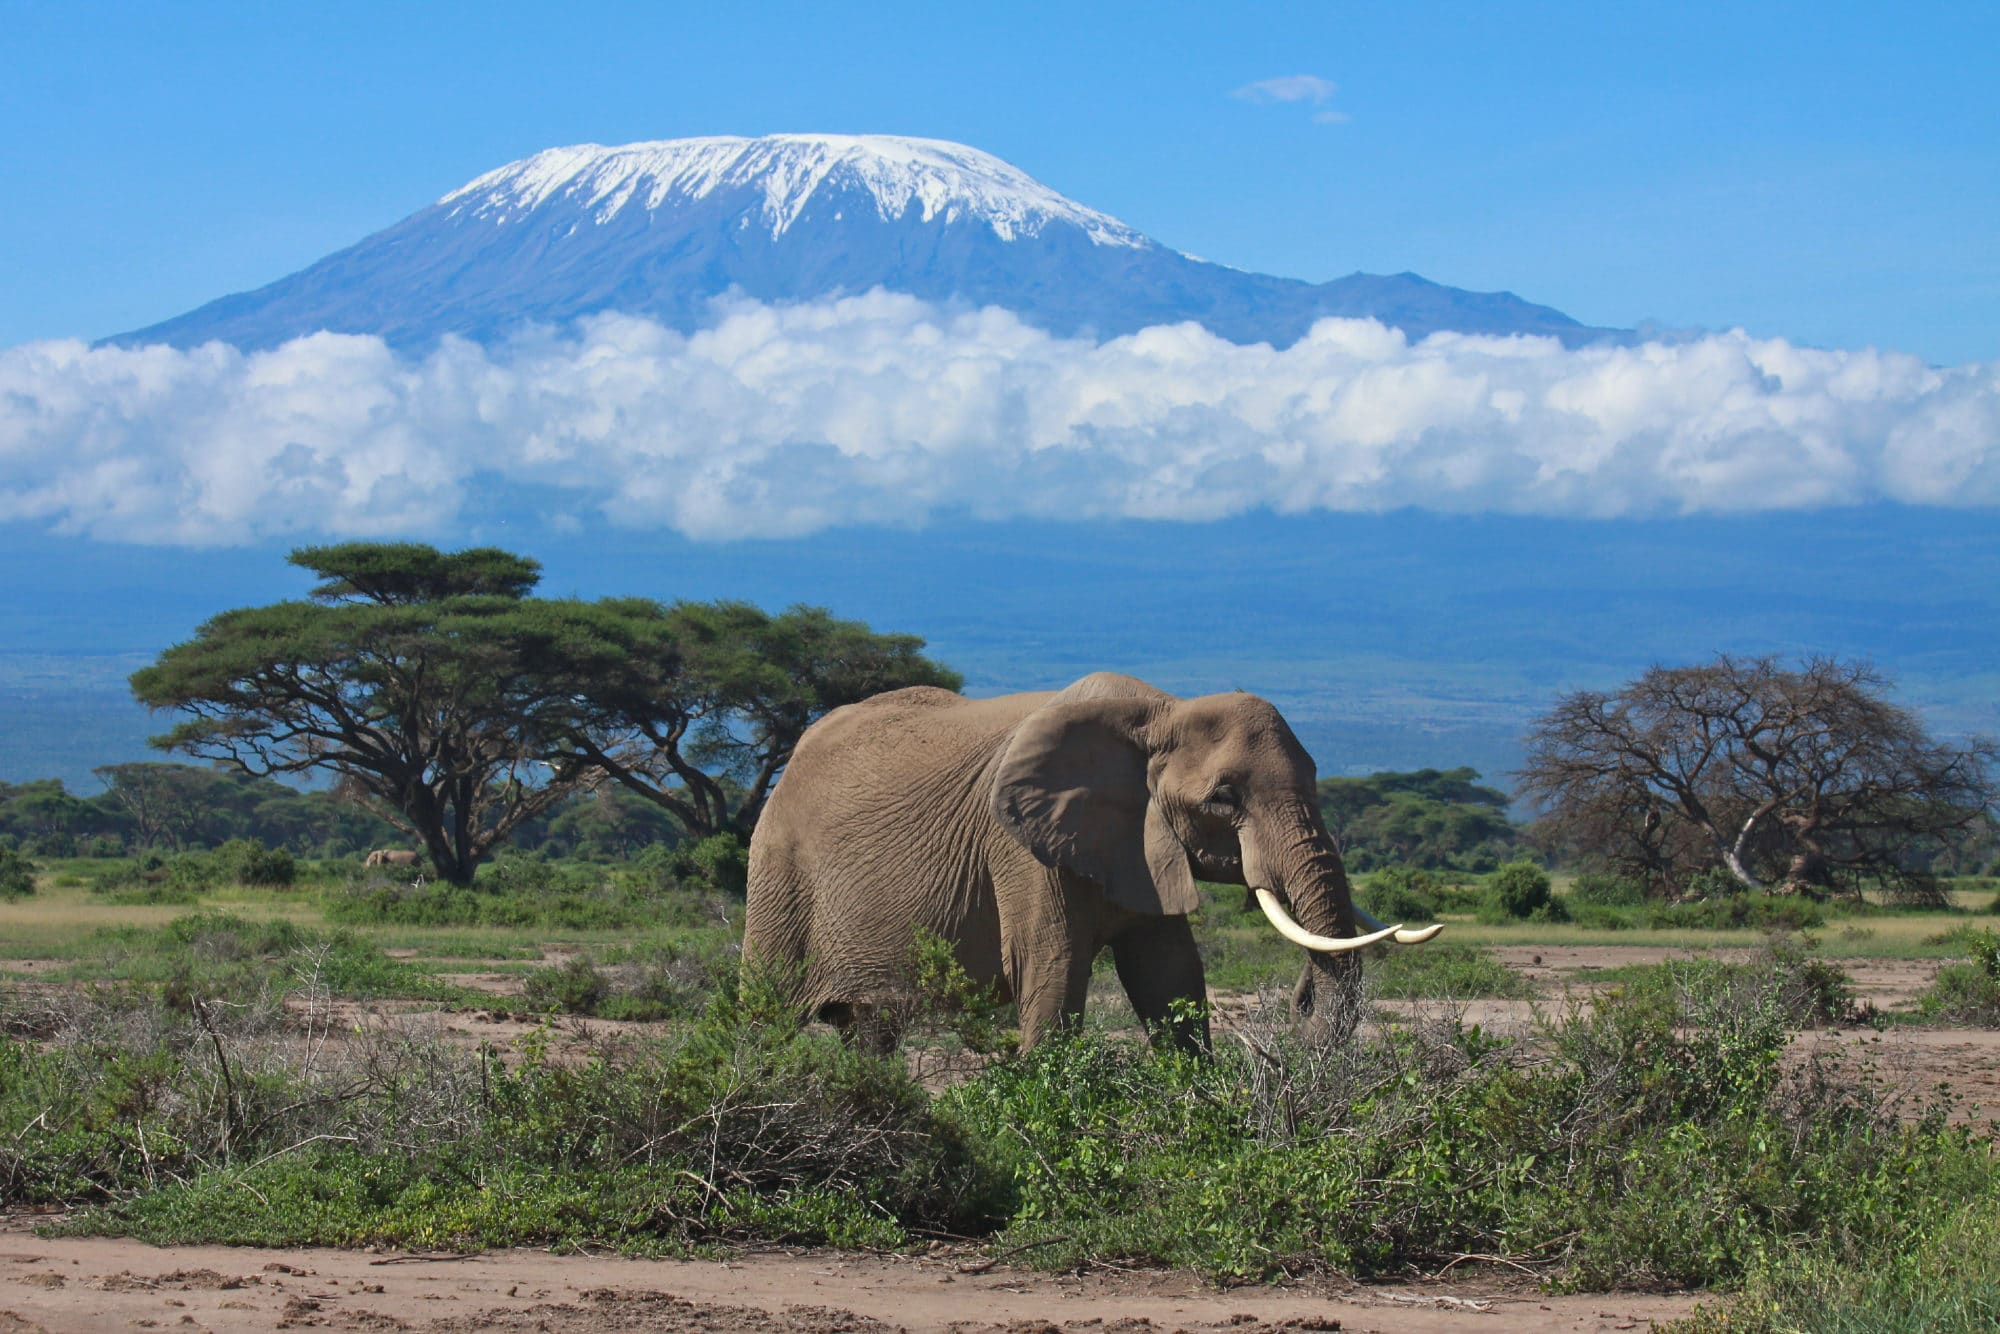 mount kilimanjaro and an elephant